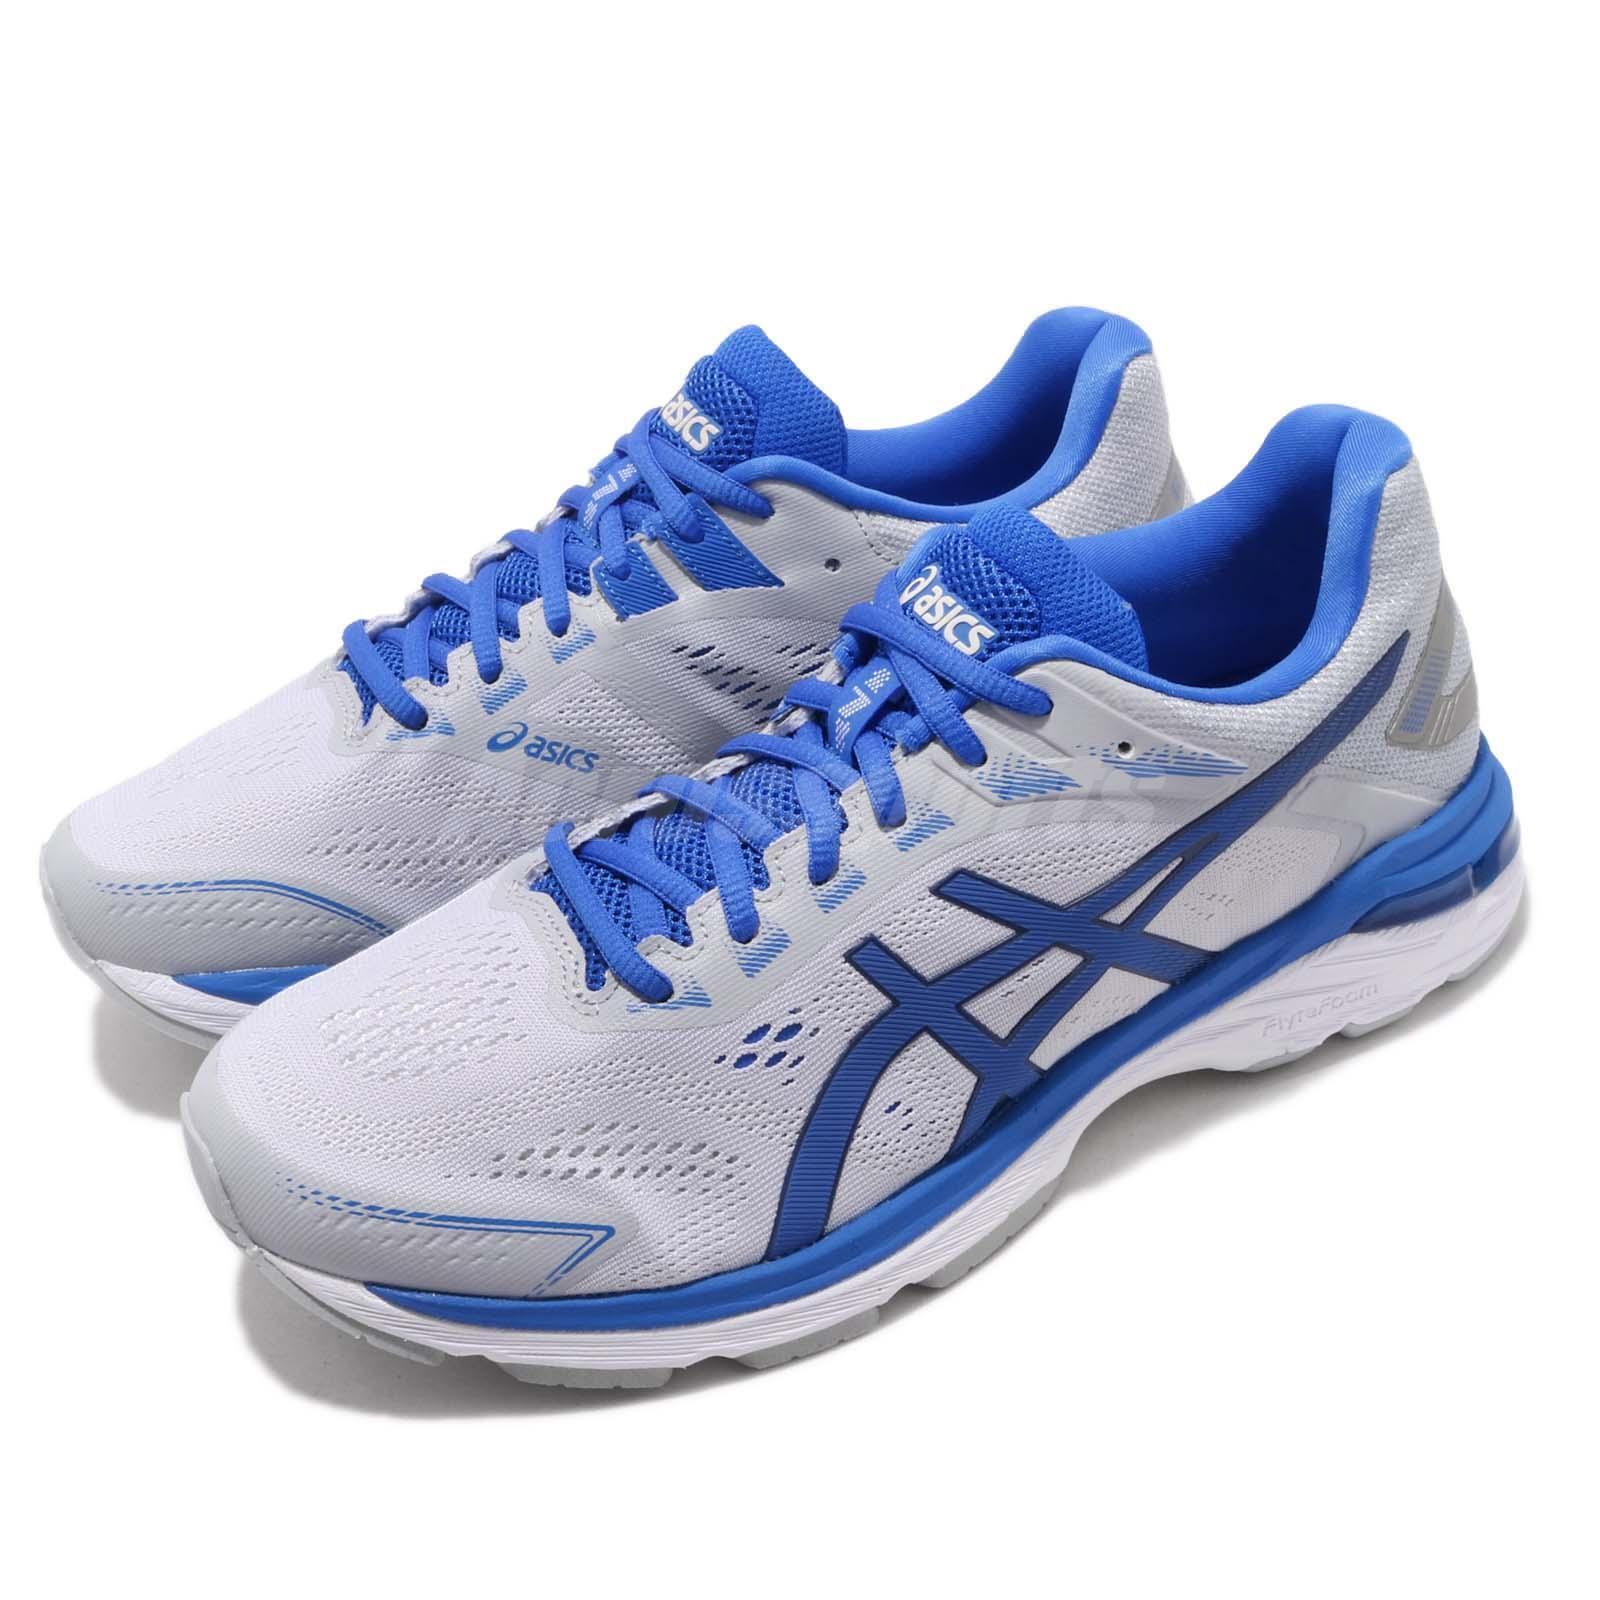 Asics GT2000 7 Lite  Show Grey blueee White Men Running shoes Sneaker 1011A203-020  80% off